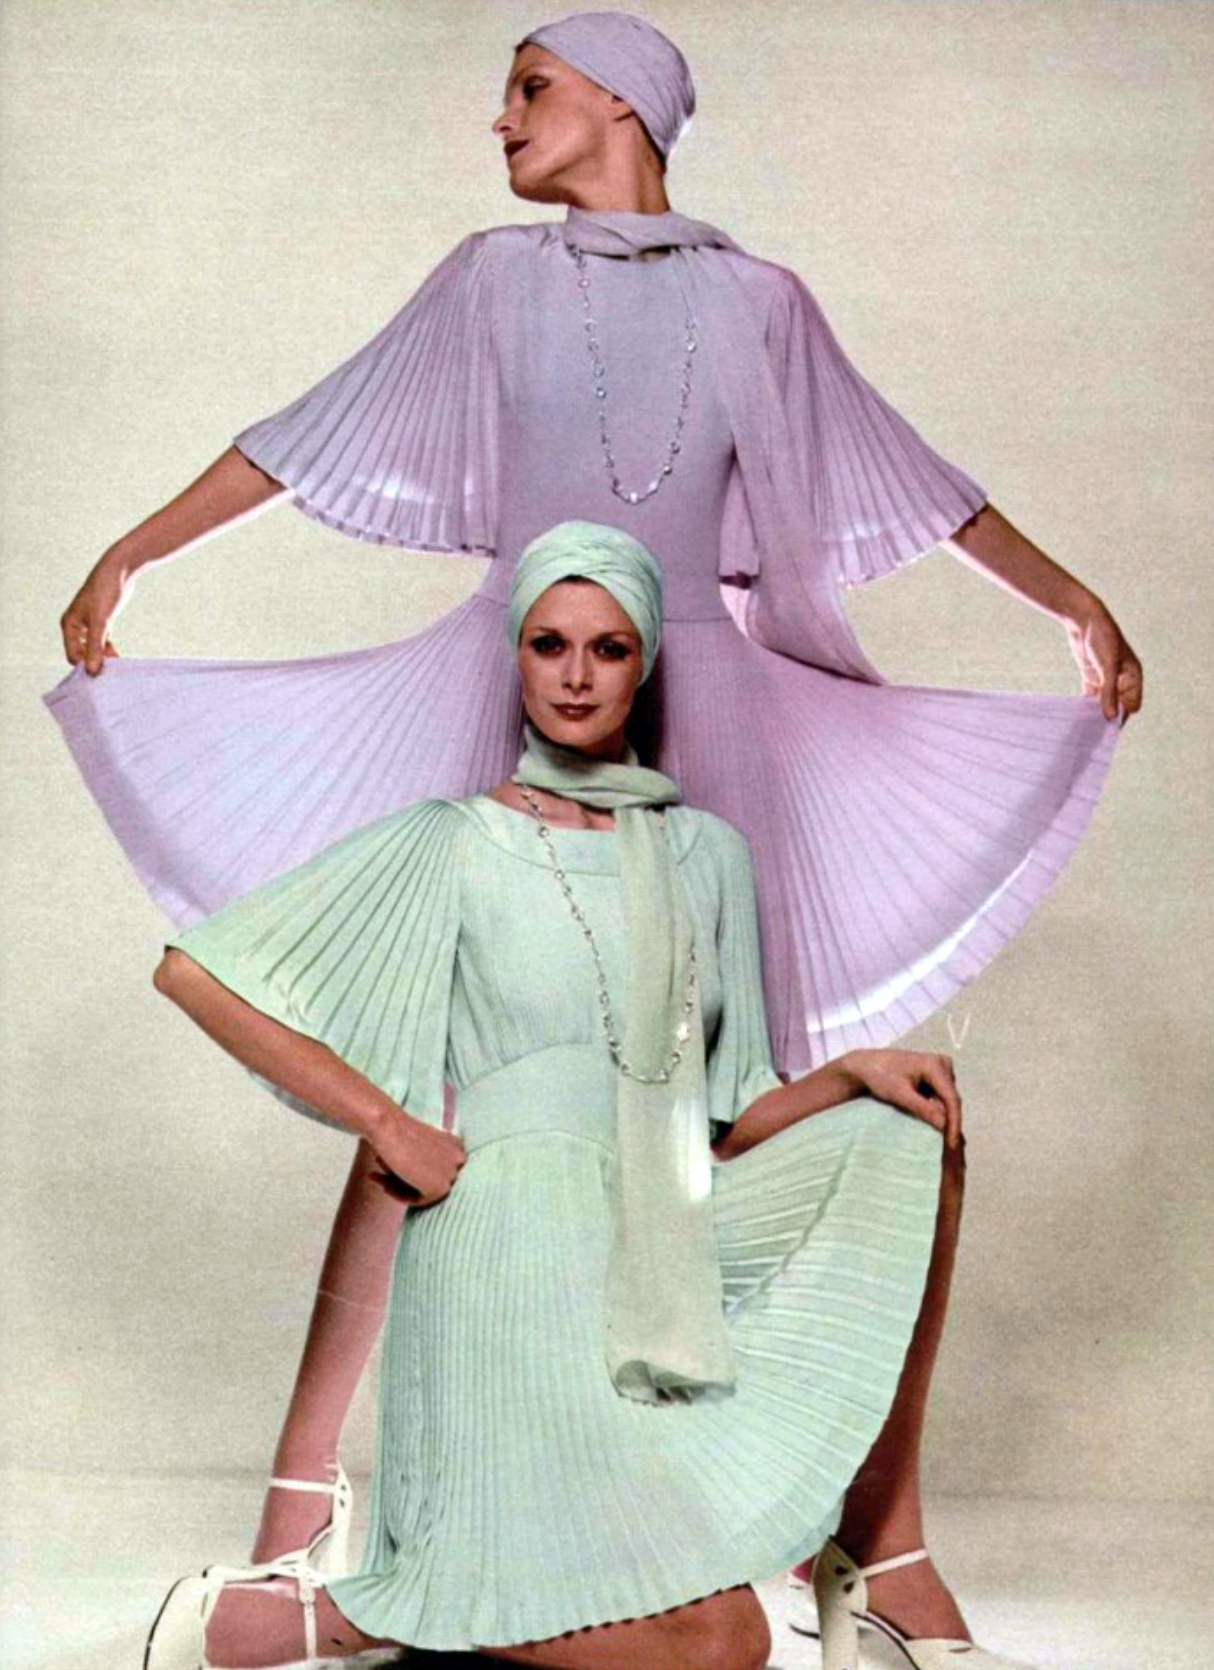 Guy Laroche L'Officiel magazine 1970s